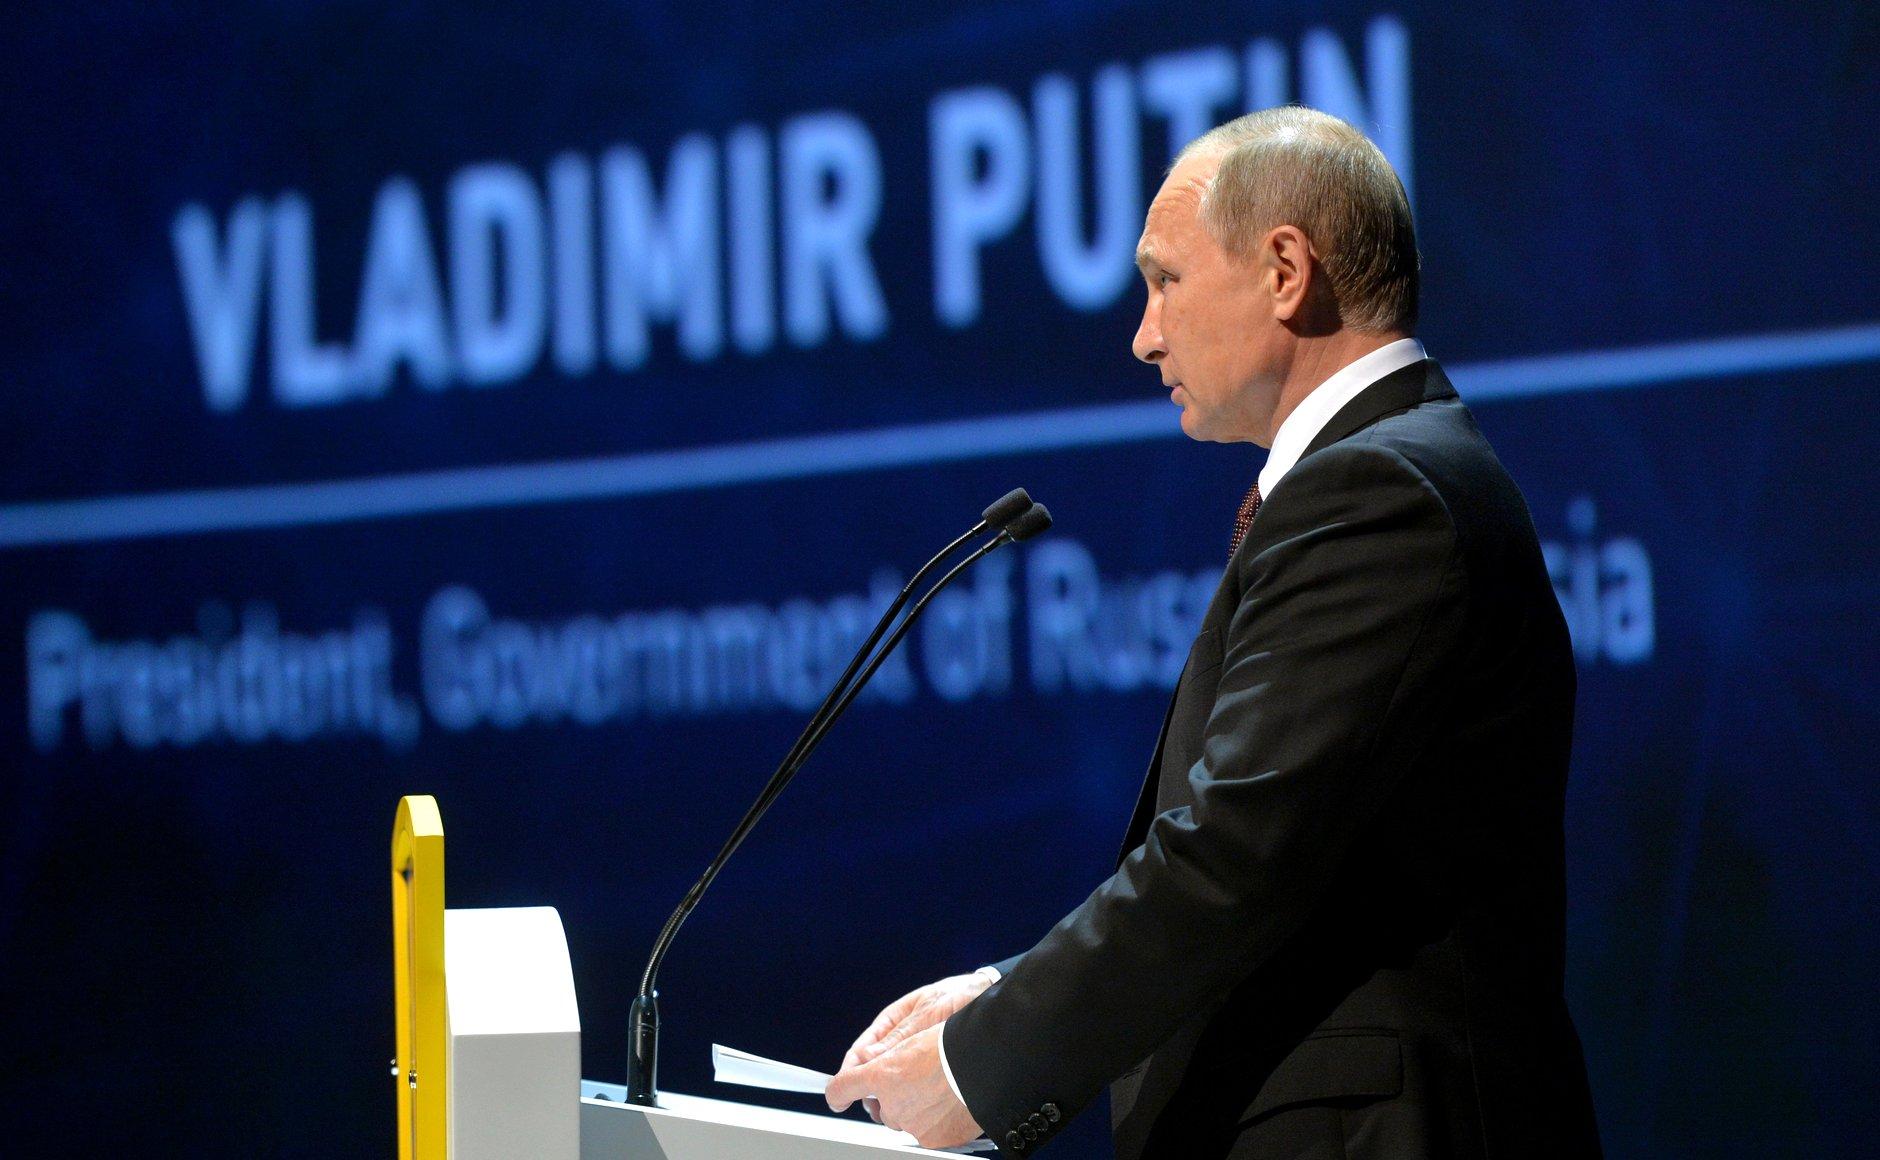 Russian President Vladimir Putin at the World Energy Congress.